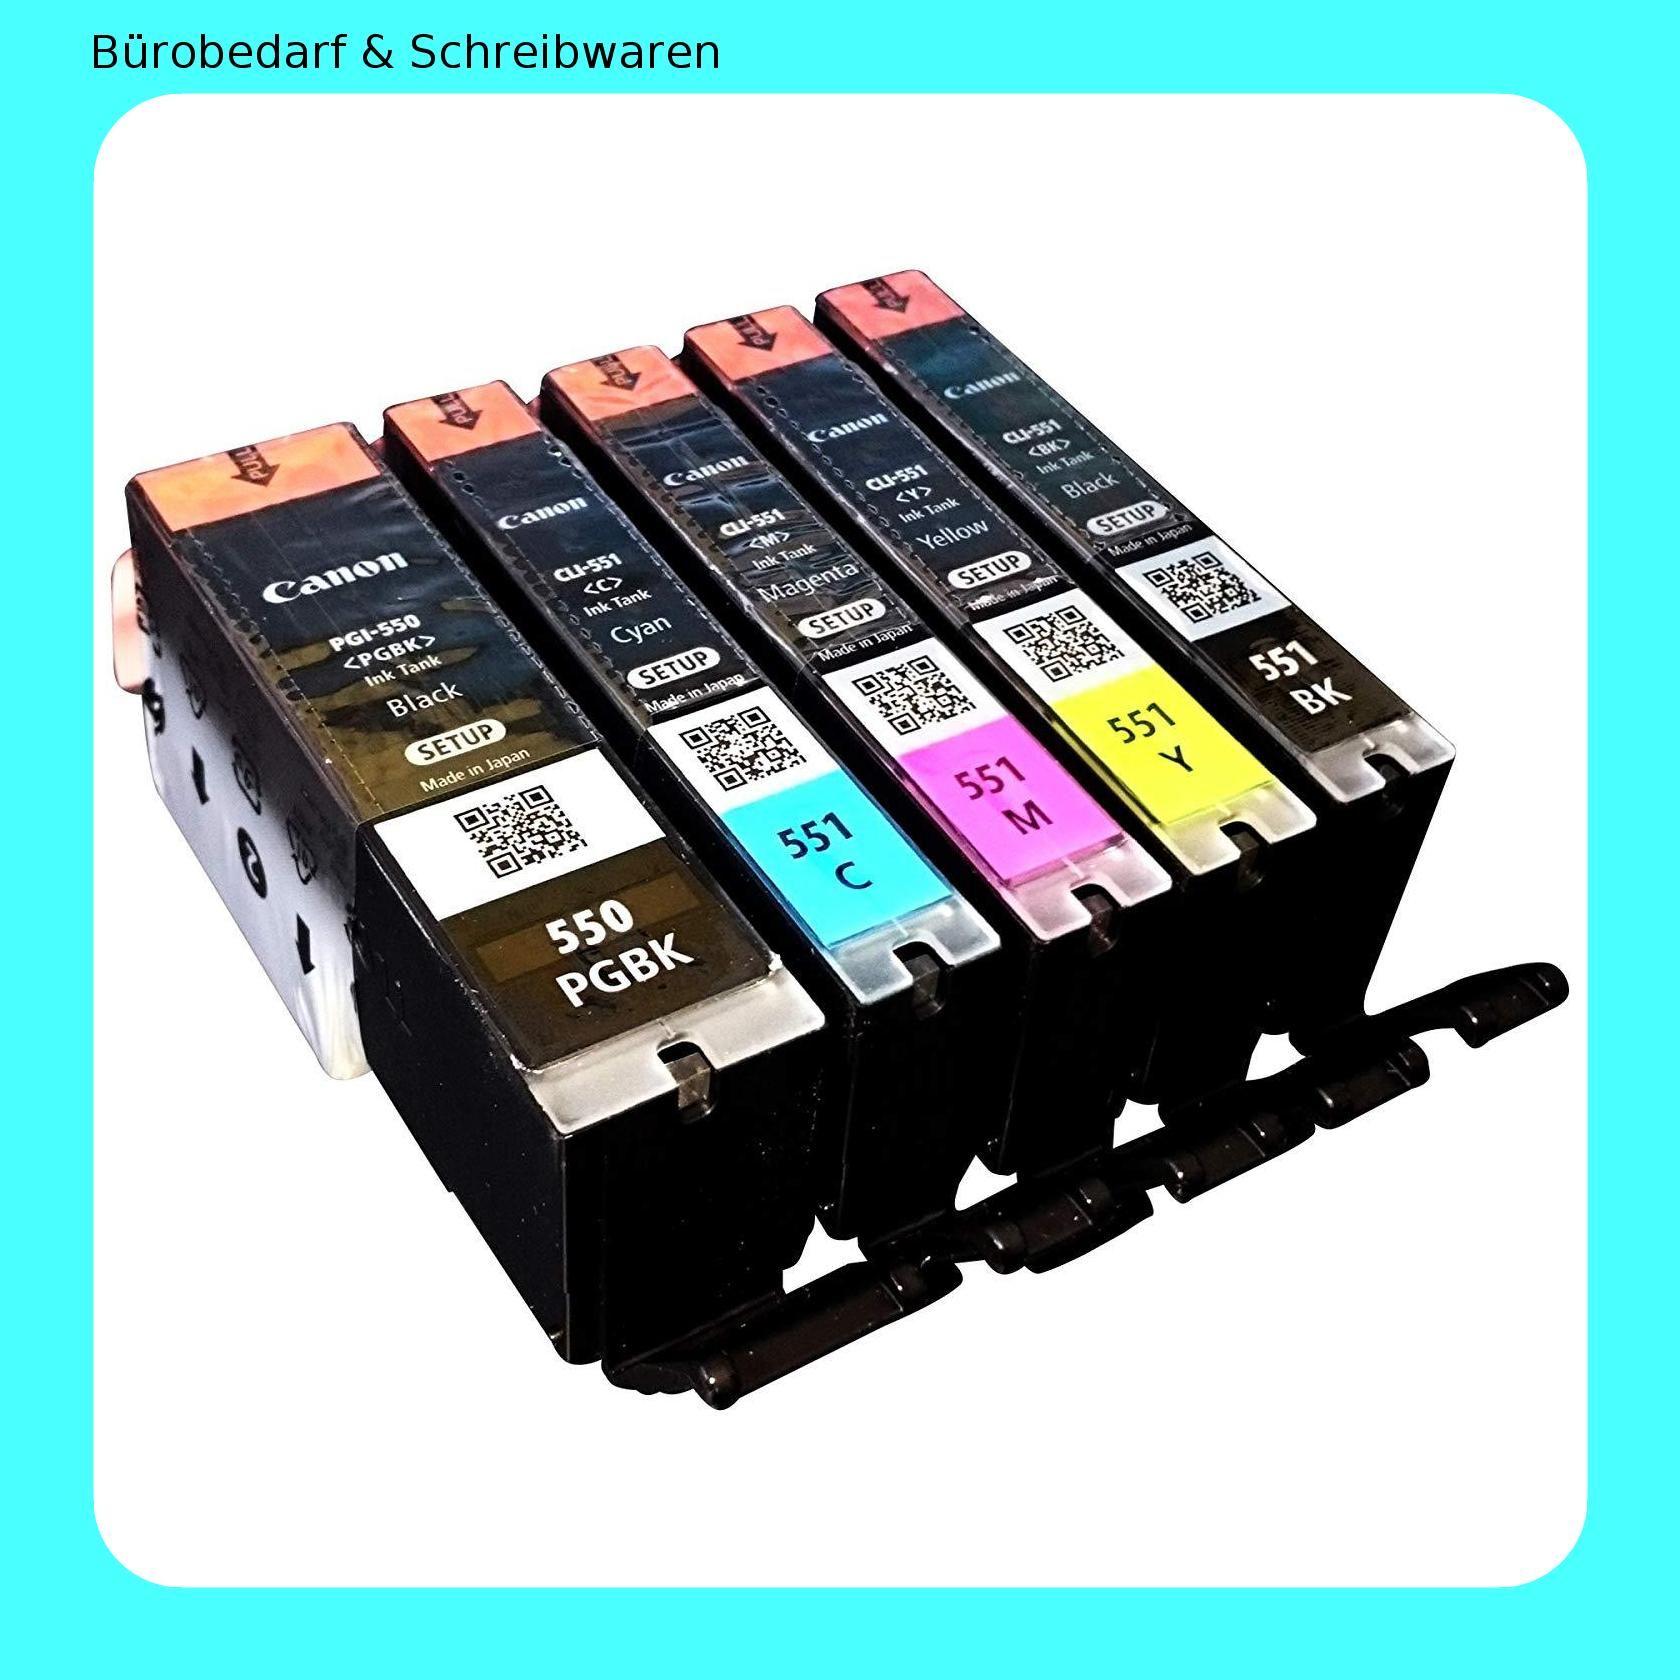 5x Original Setp Up Tintenpatrone Fur Canon Pixma Ip 7250 Mg 5450 Mg 6350 Mx 725 Mx 925 Pgi550 Pgi 550 Cli551 Cli 551 Bk Verpackung Patronen Und Tinte